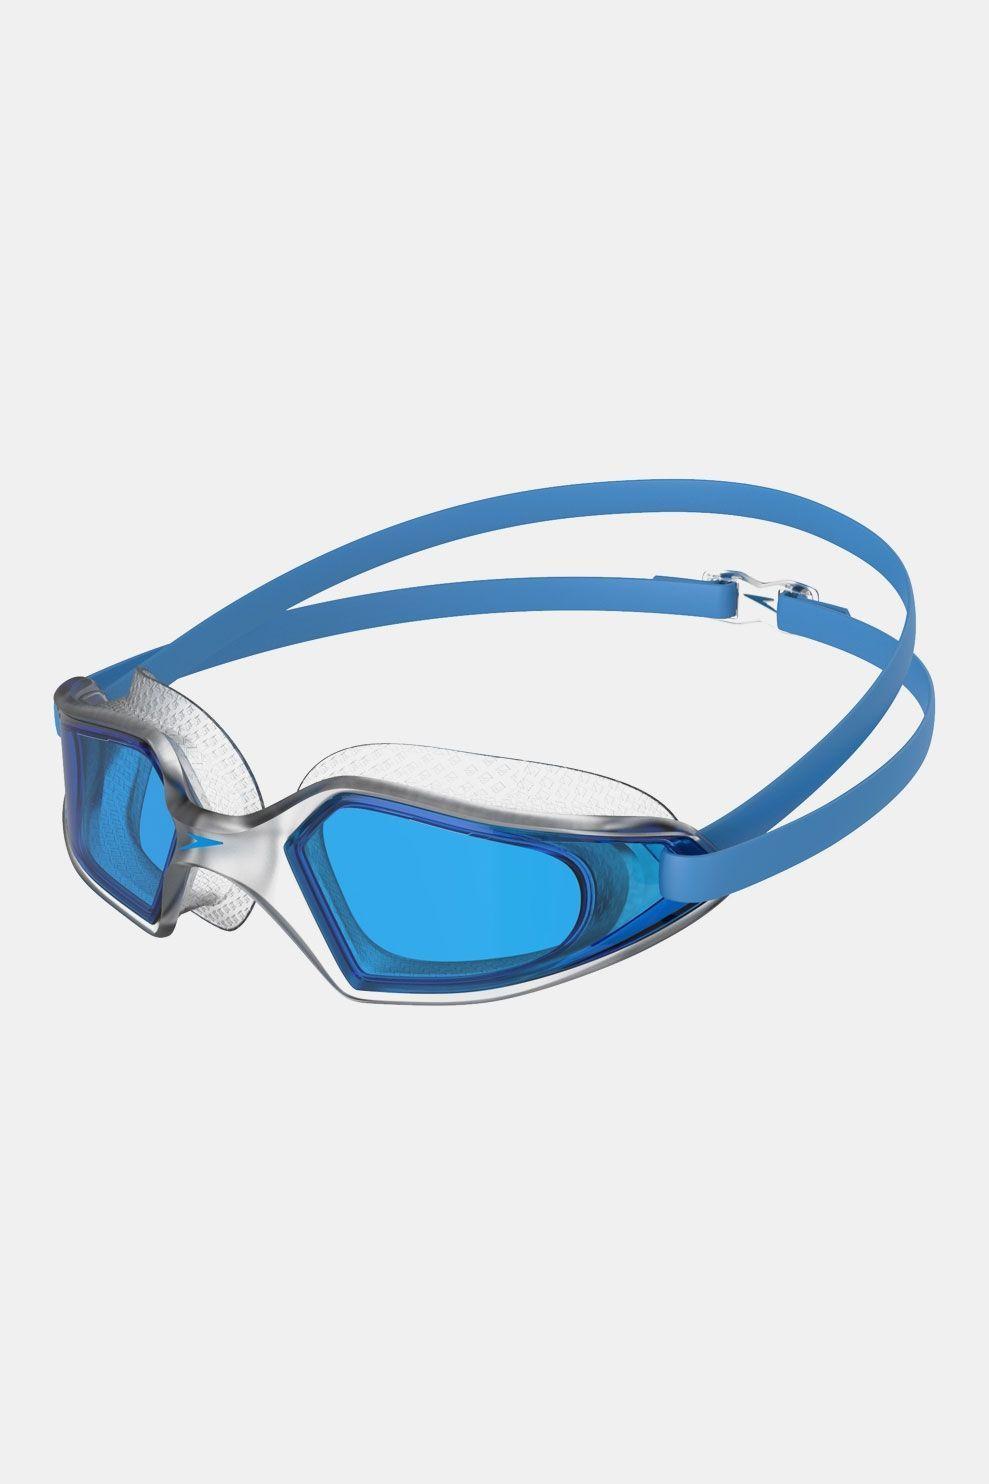 Speedo Hydropulse Zwembril Blauw/Wit